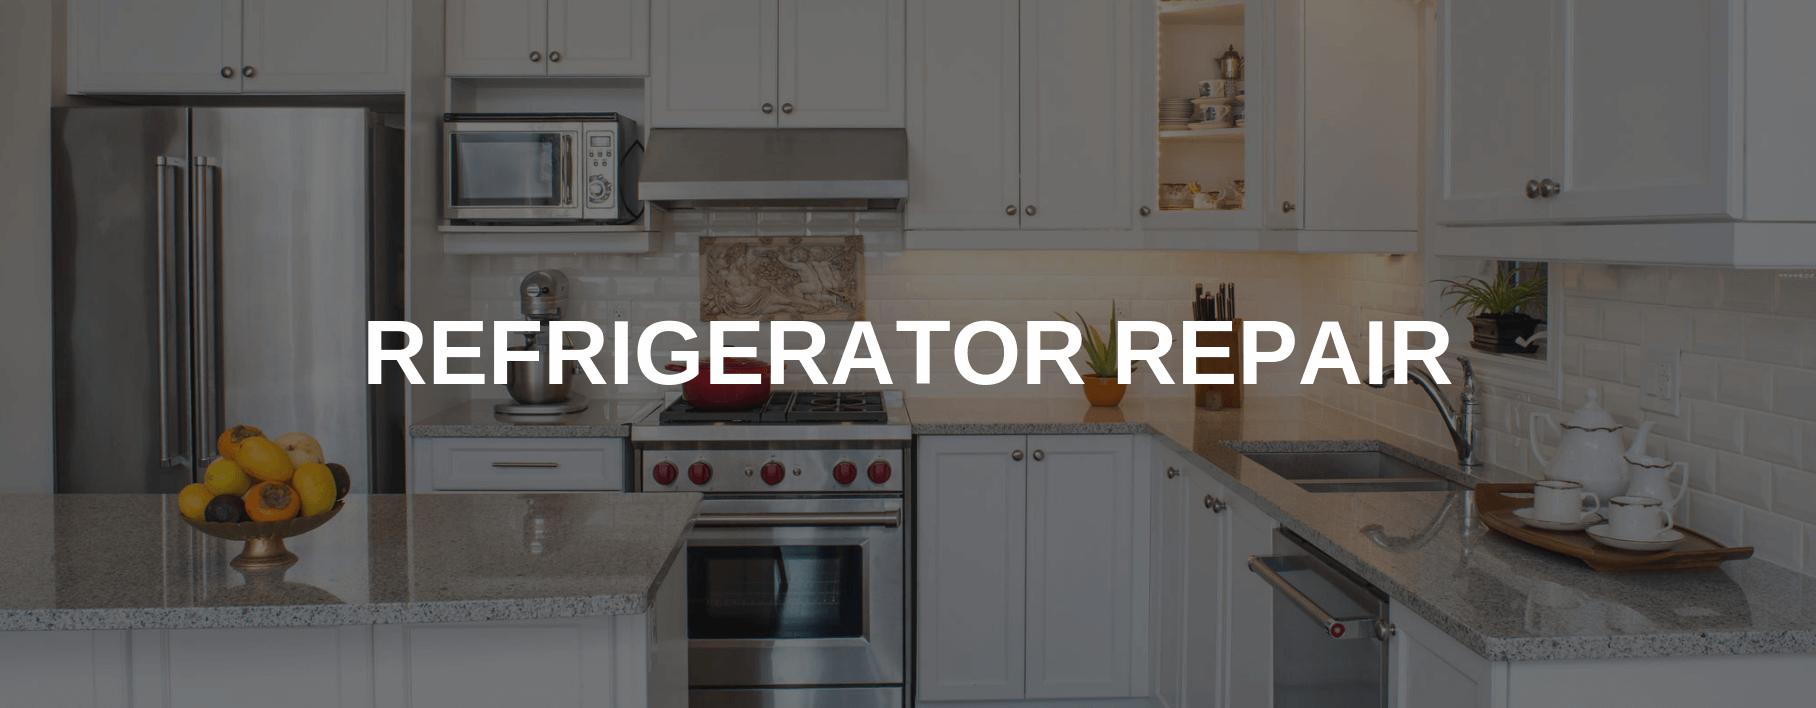 woodland hills refrigerator repair